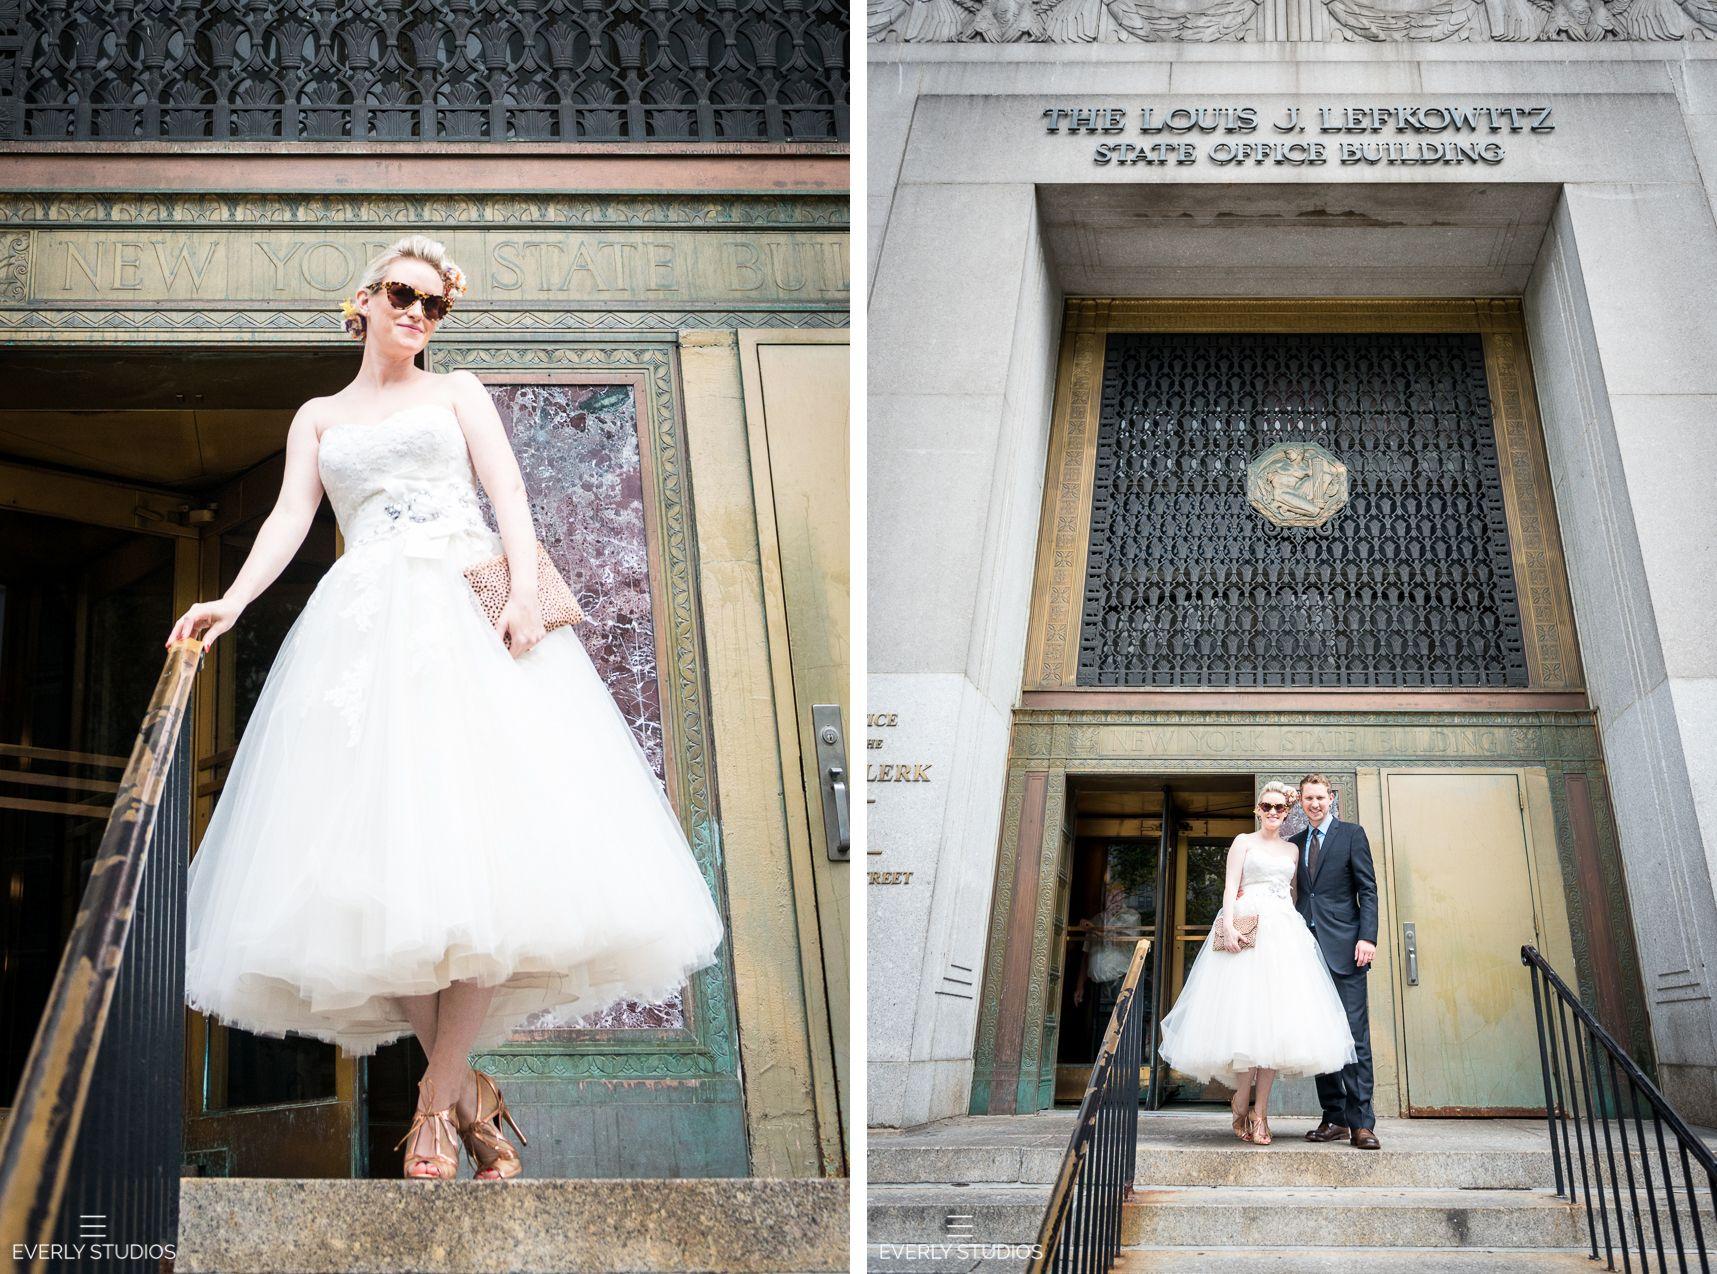 New York City Hall Wedding Photography Photos Taken By Photographer Jocelyn Voo Of Everly Studios